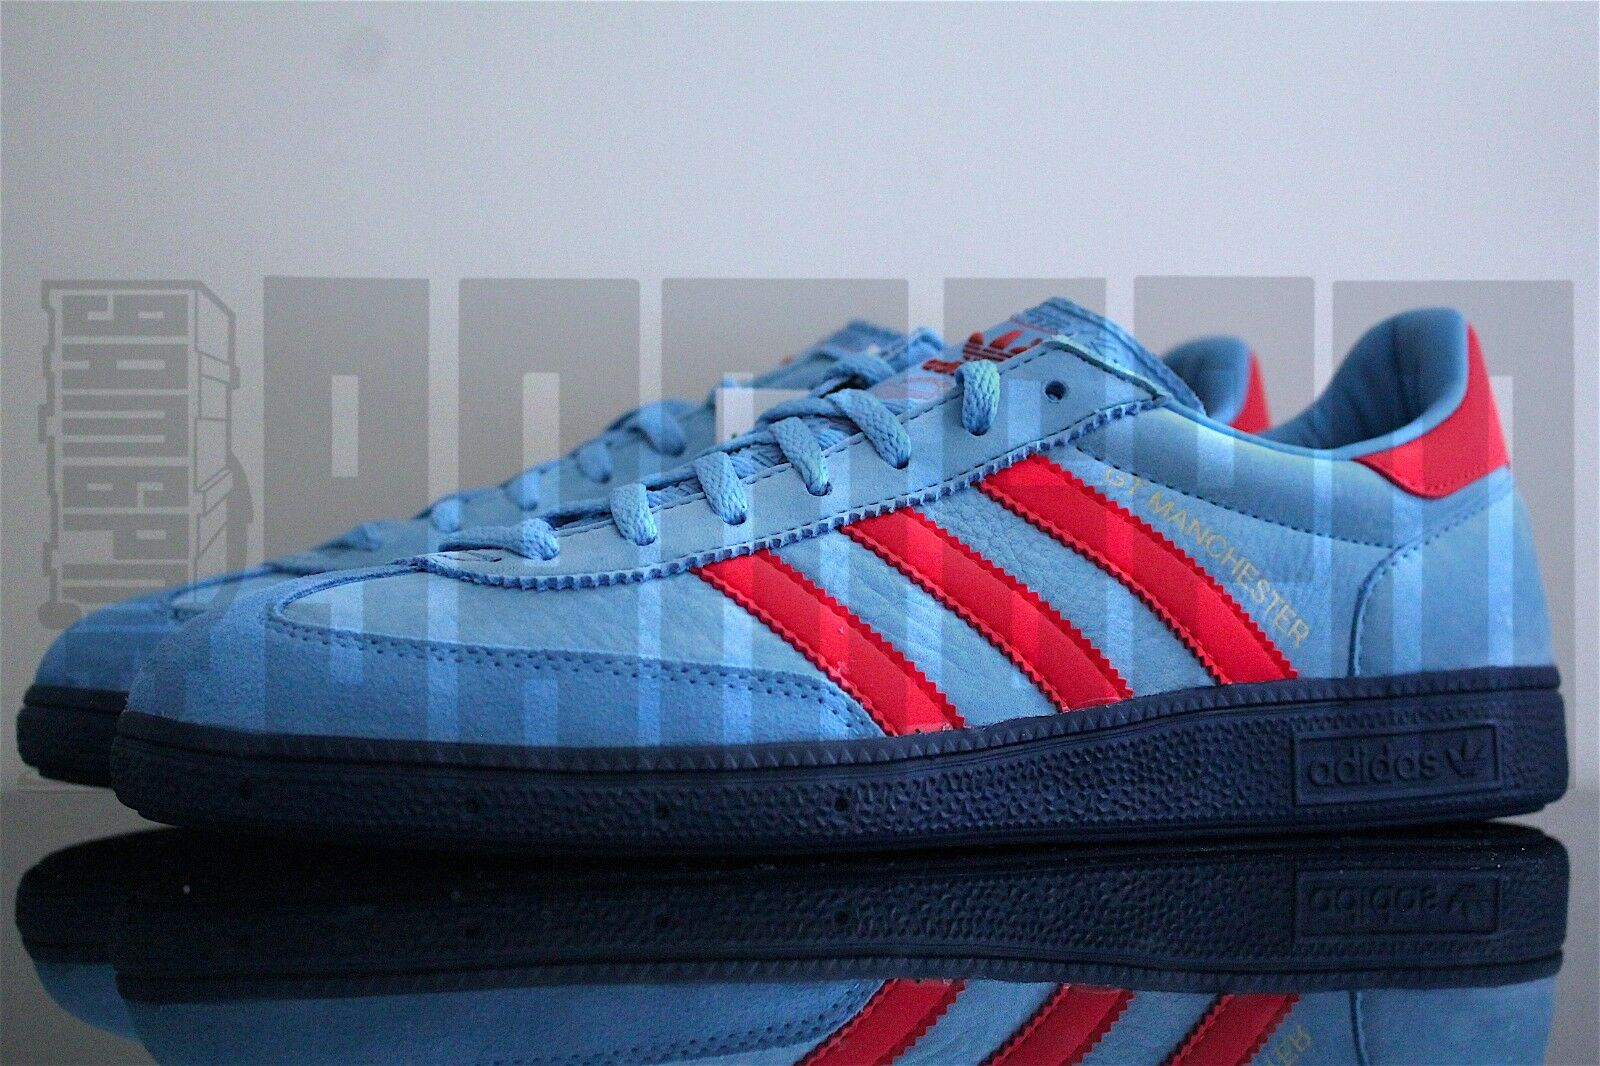 2016 Adidas GT MANCHESTER SPEZIAL 3 4 5 6 7 8 9 10 11 12 13 BLUE RED spzl marine